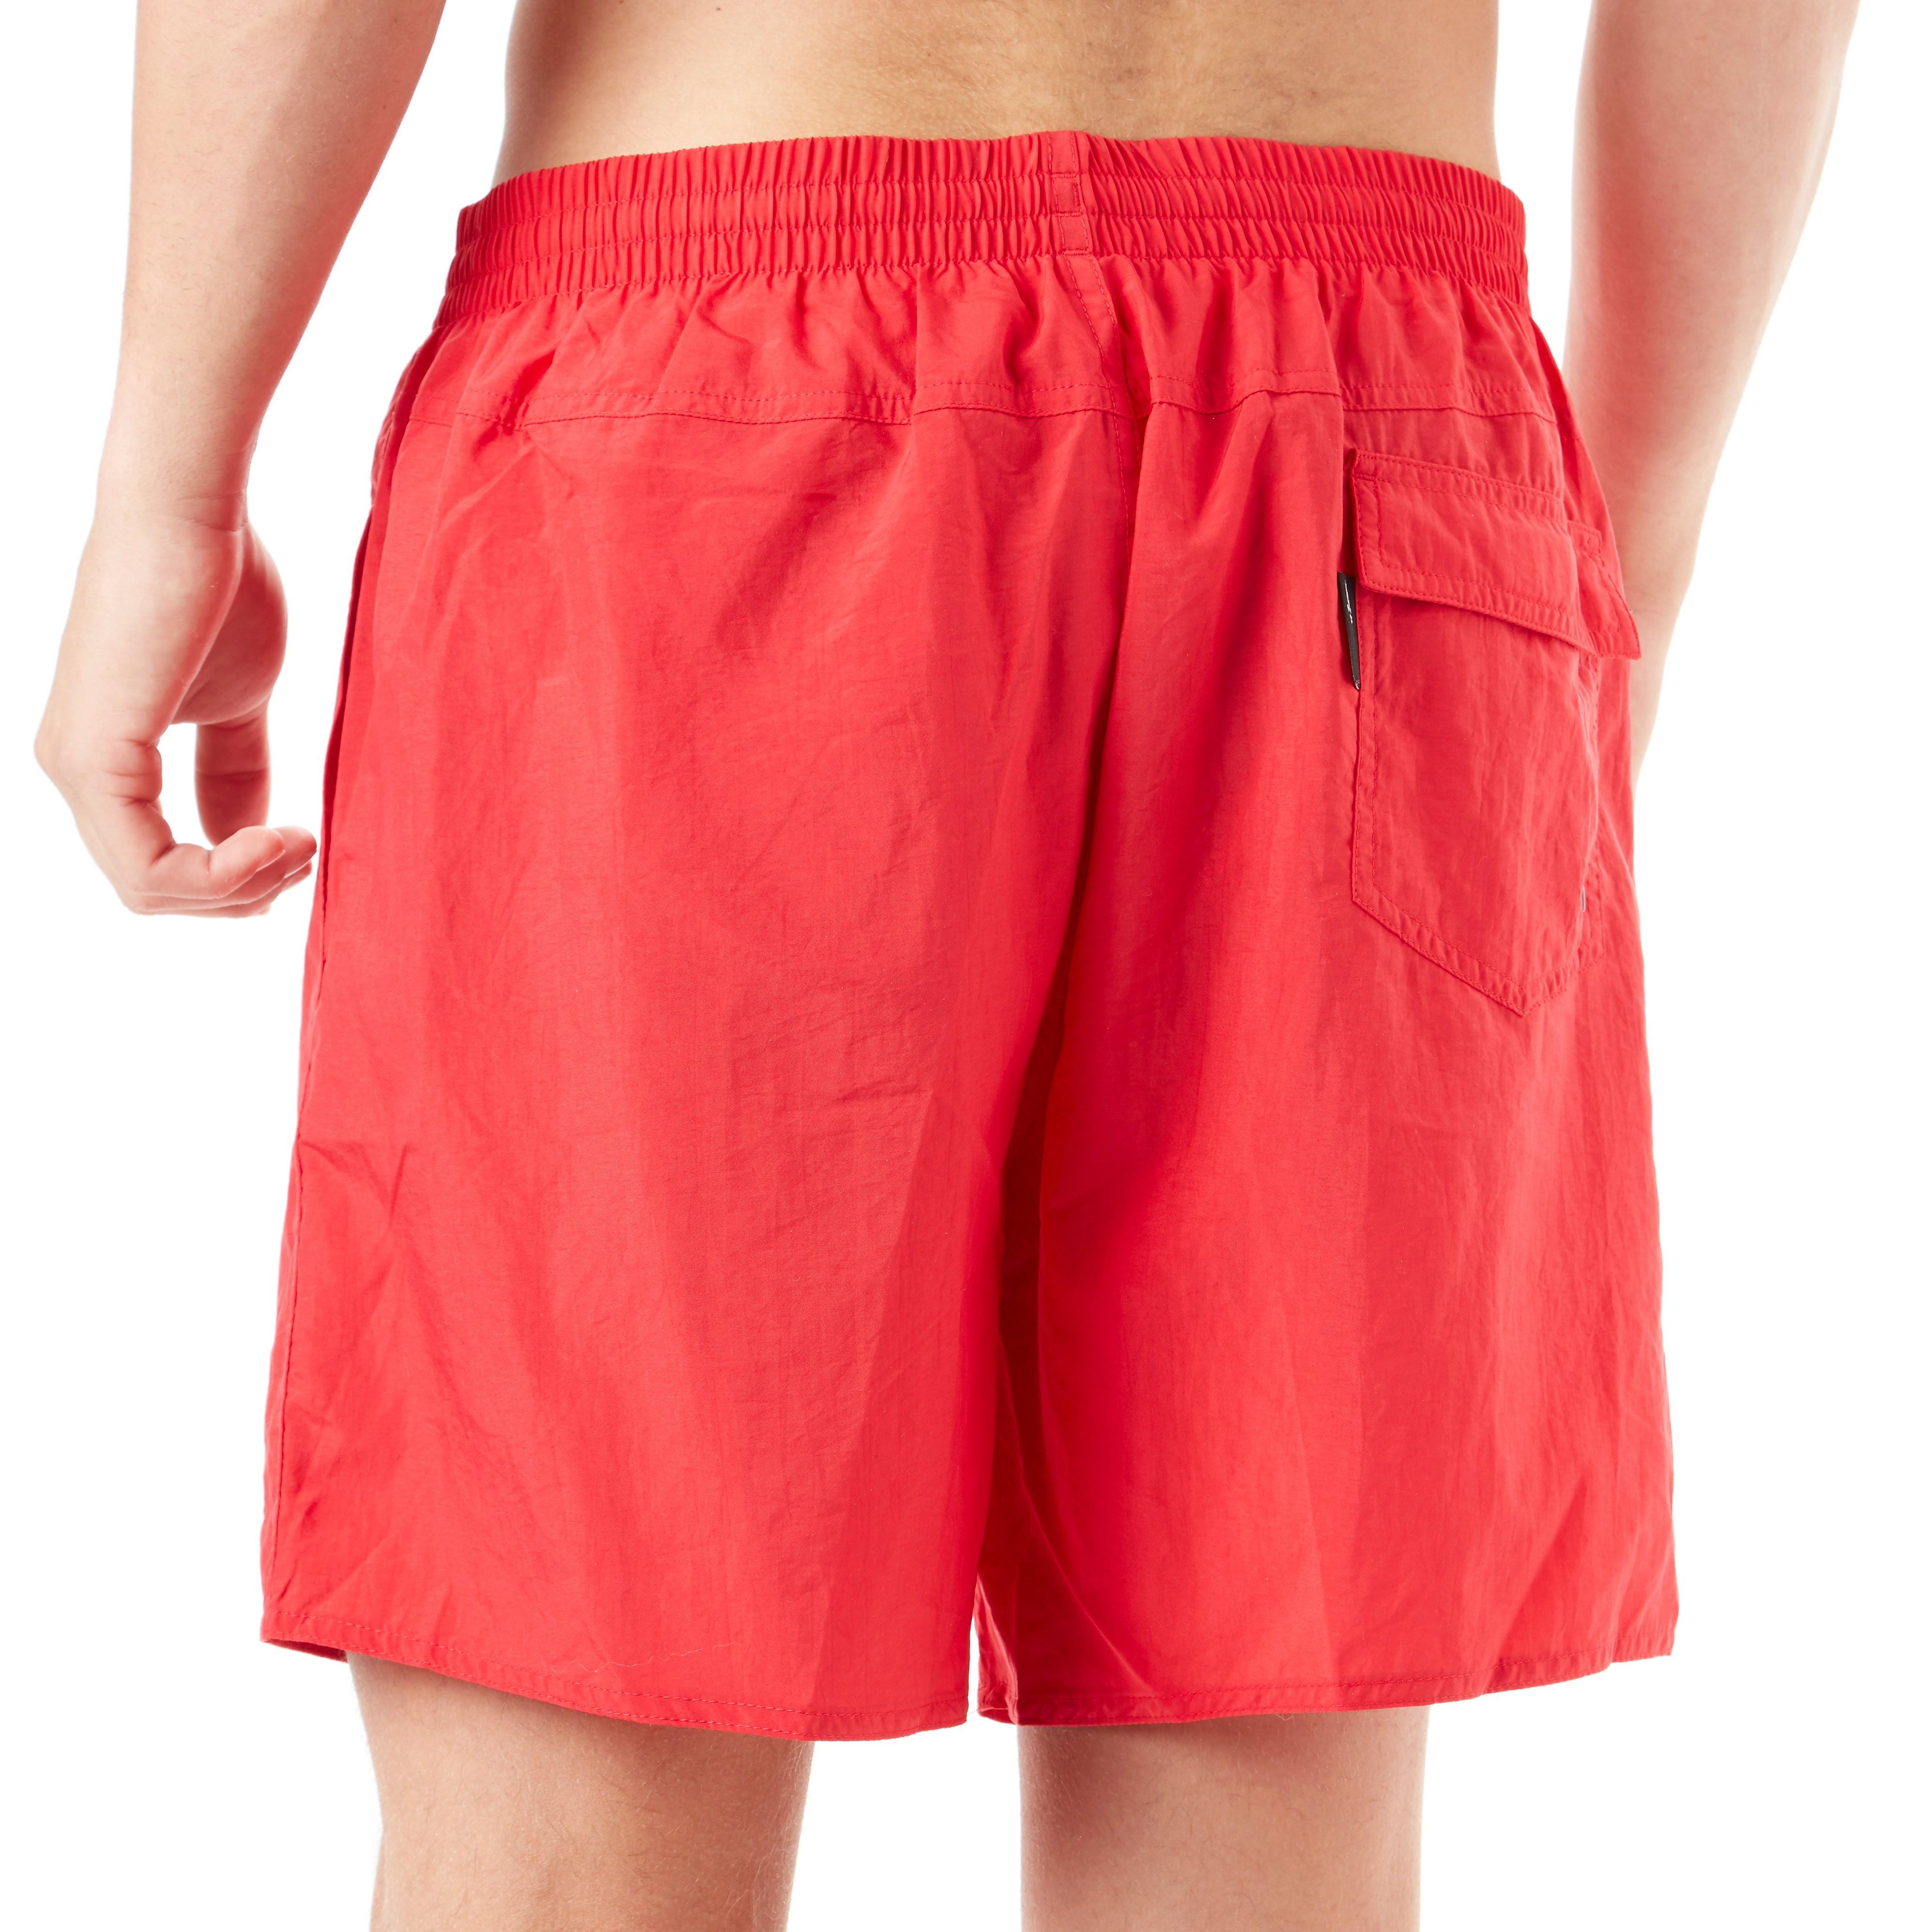 "Speedo Solid Leisure 16"" Water Shorts"